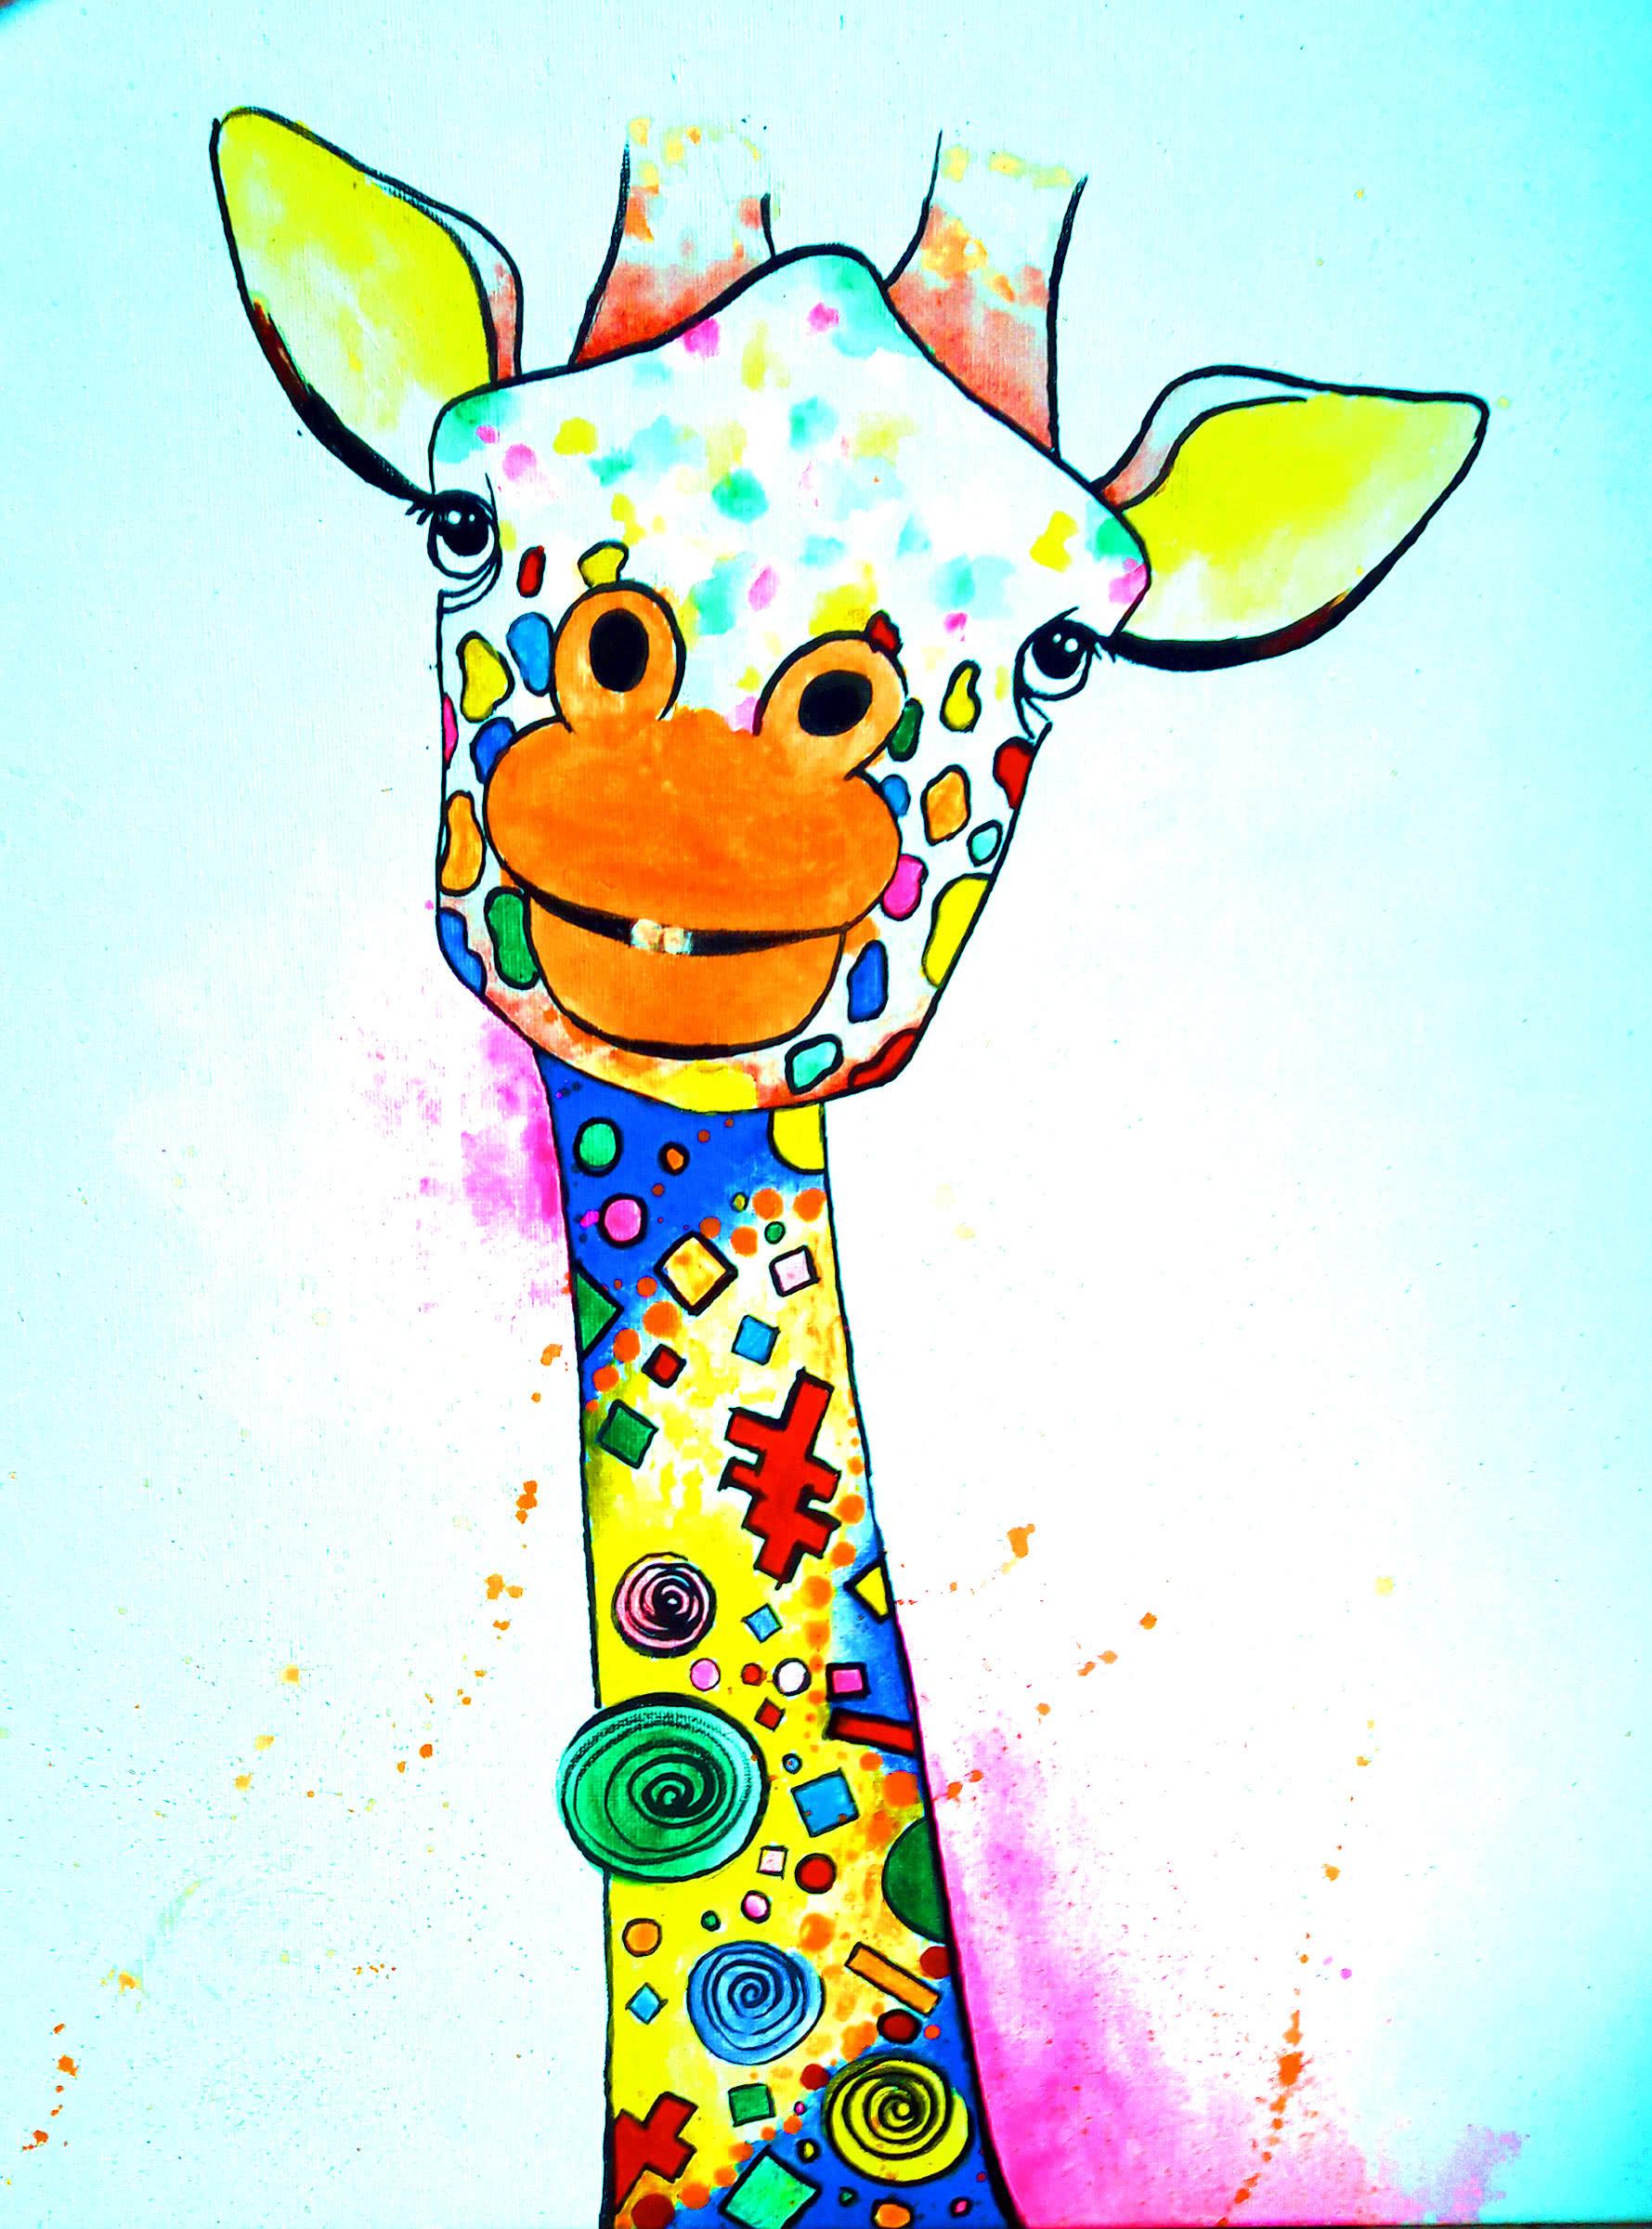 Funny Giraffe - ArtMasters